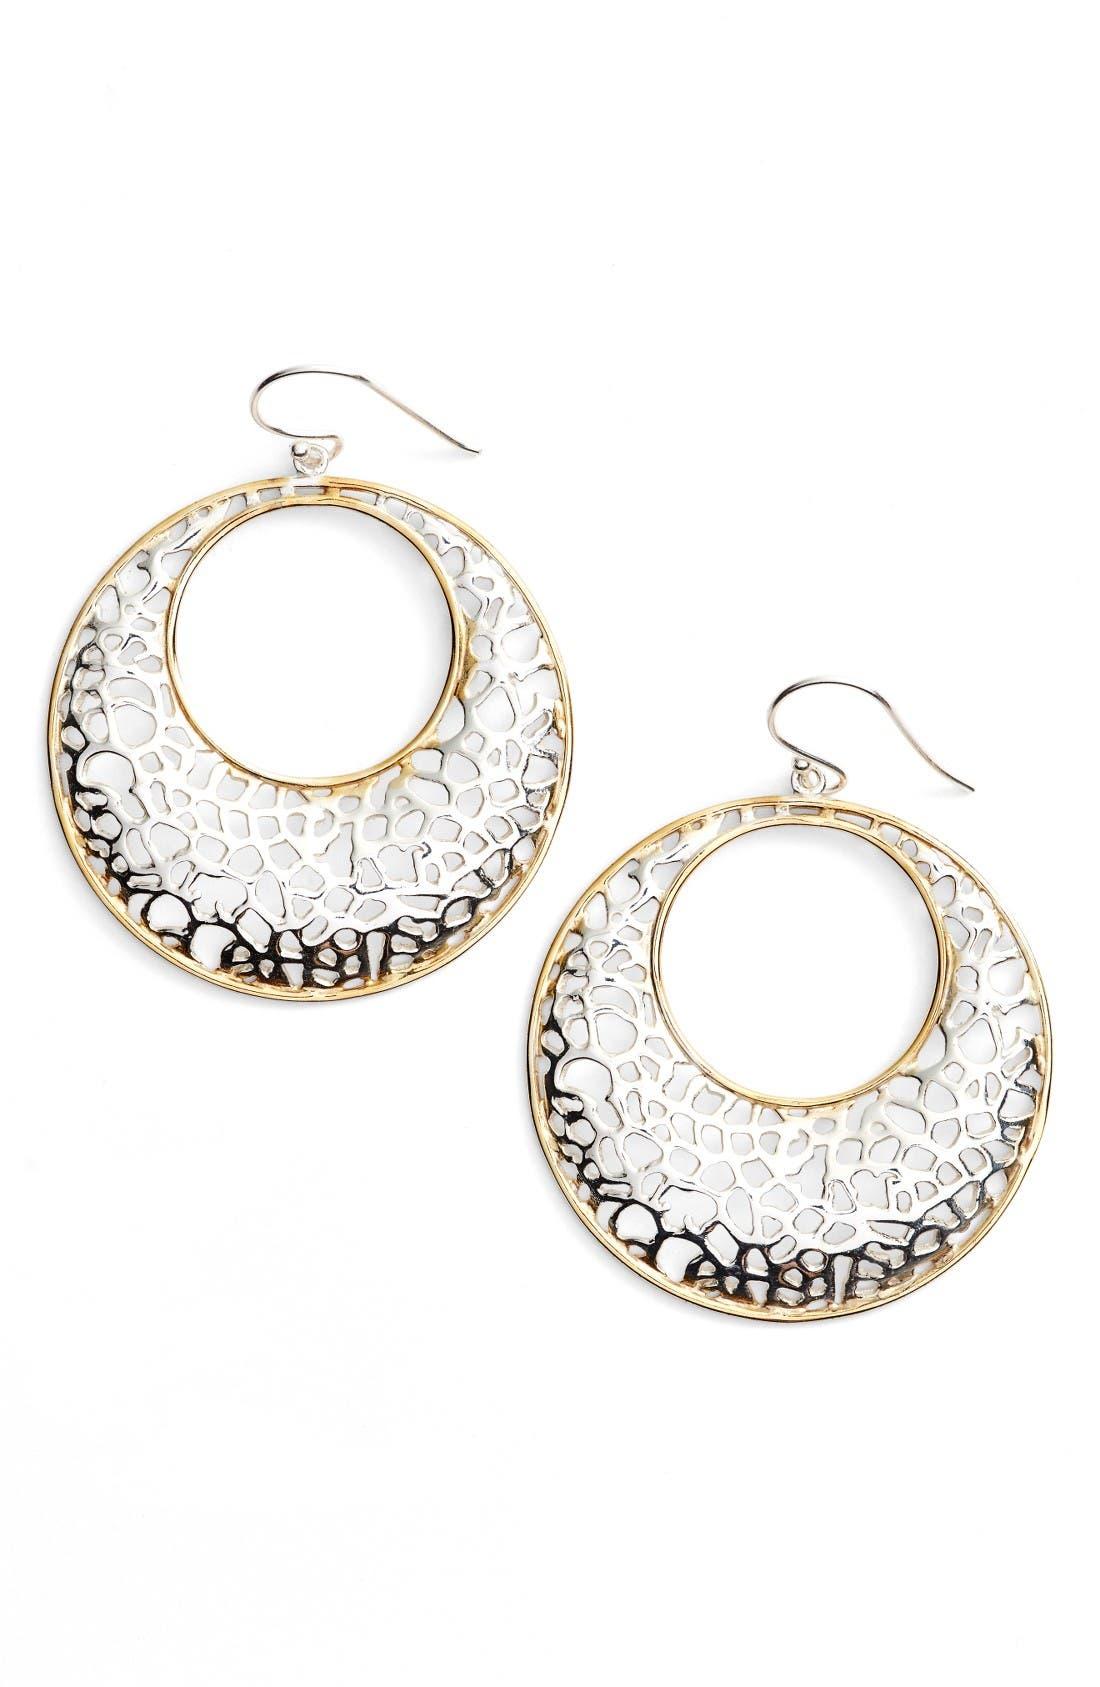 Alternate Image 1 Selected - Argento Vivo Two Tone Circle Lace Earrings